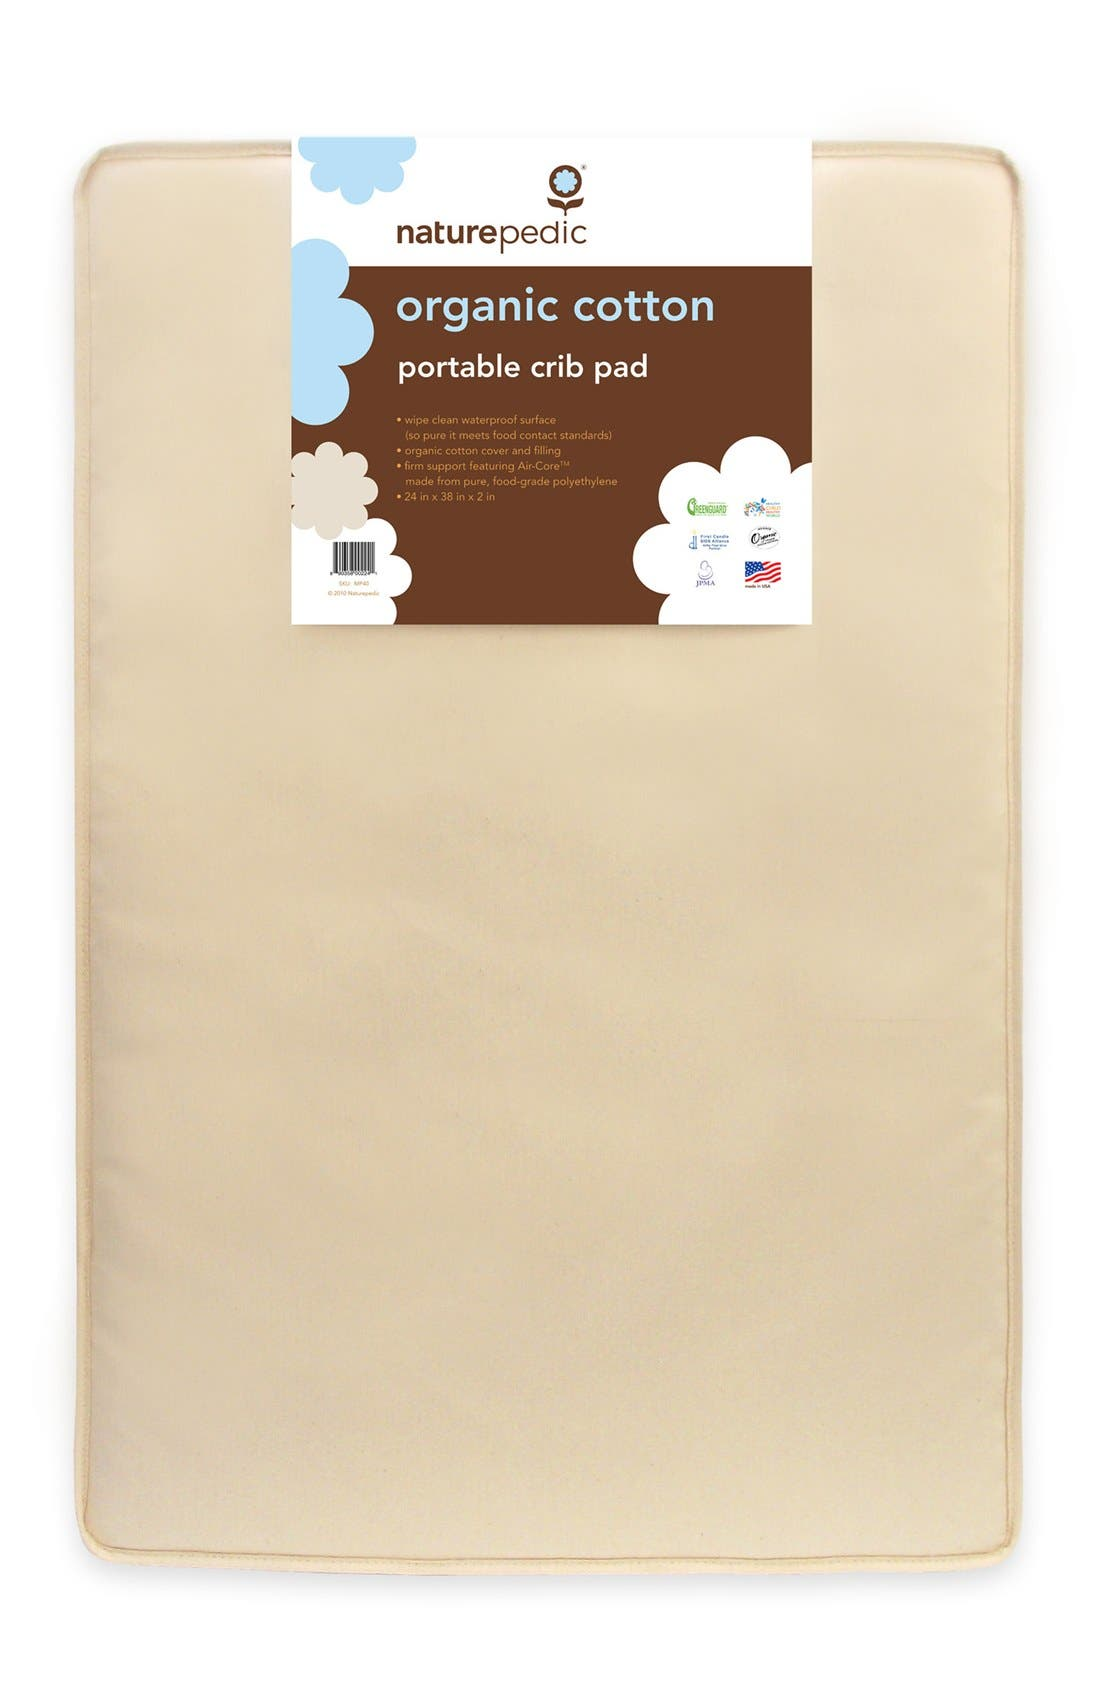 Naturepedic Organic Cotton Portable Crib Pad